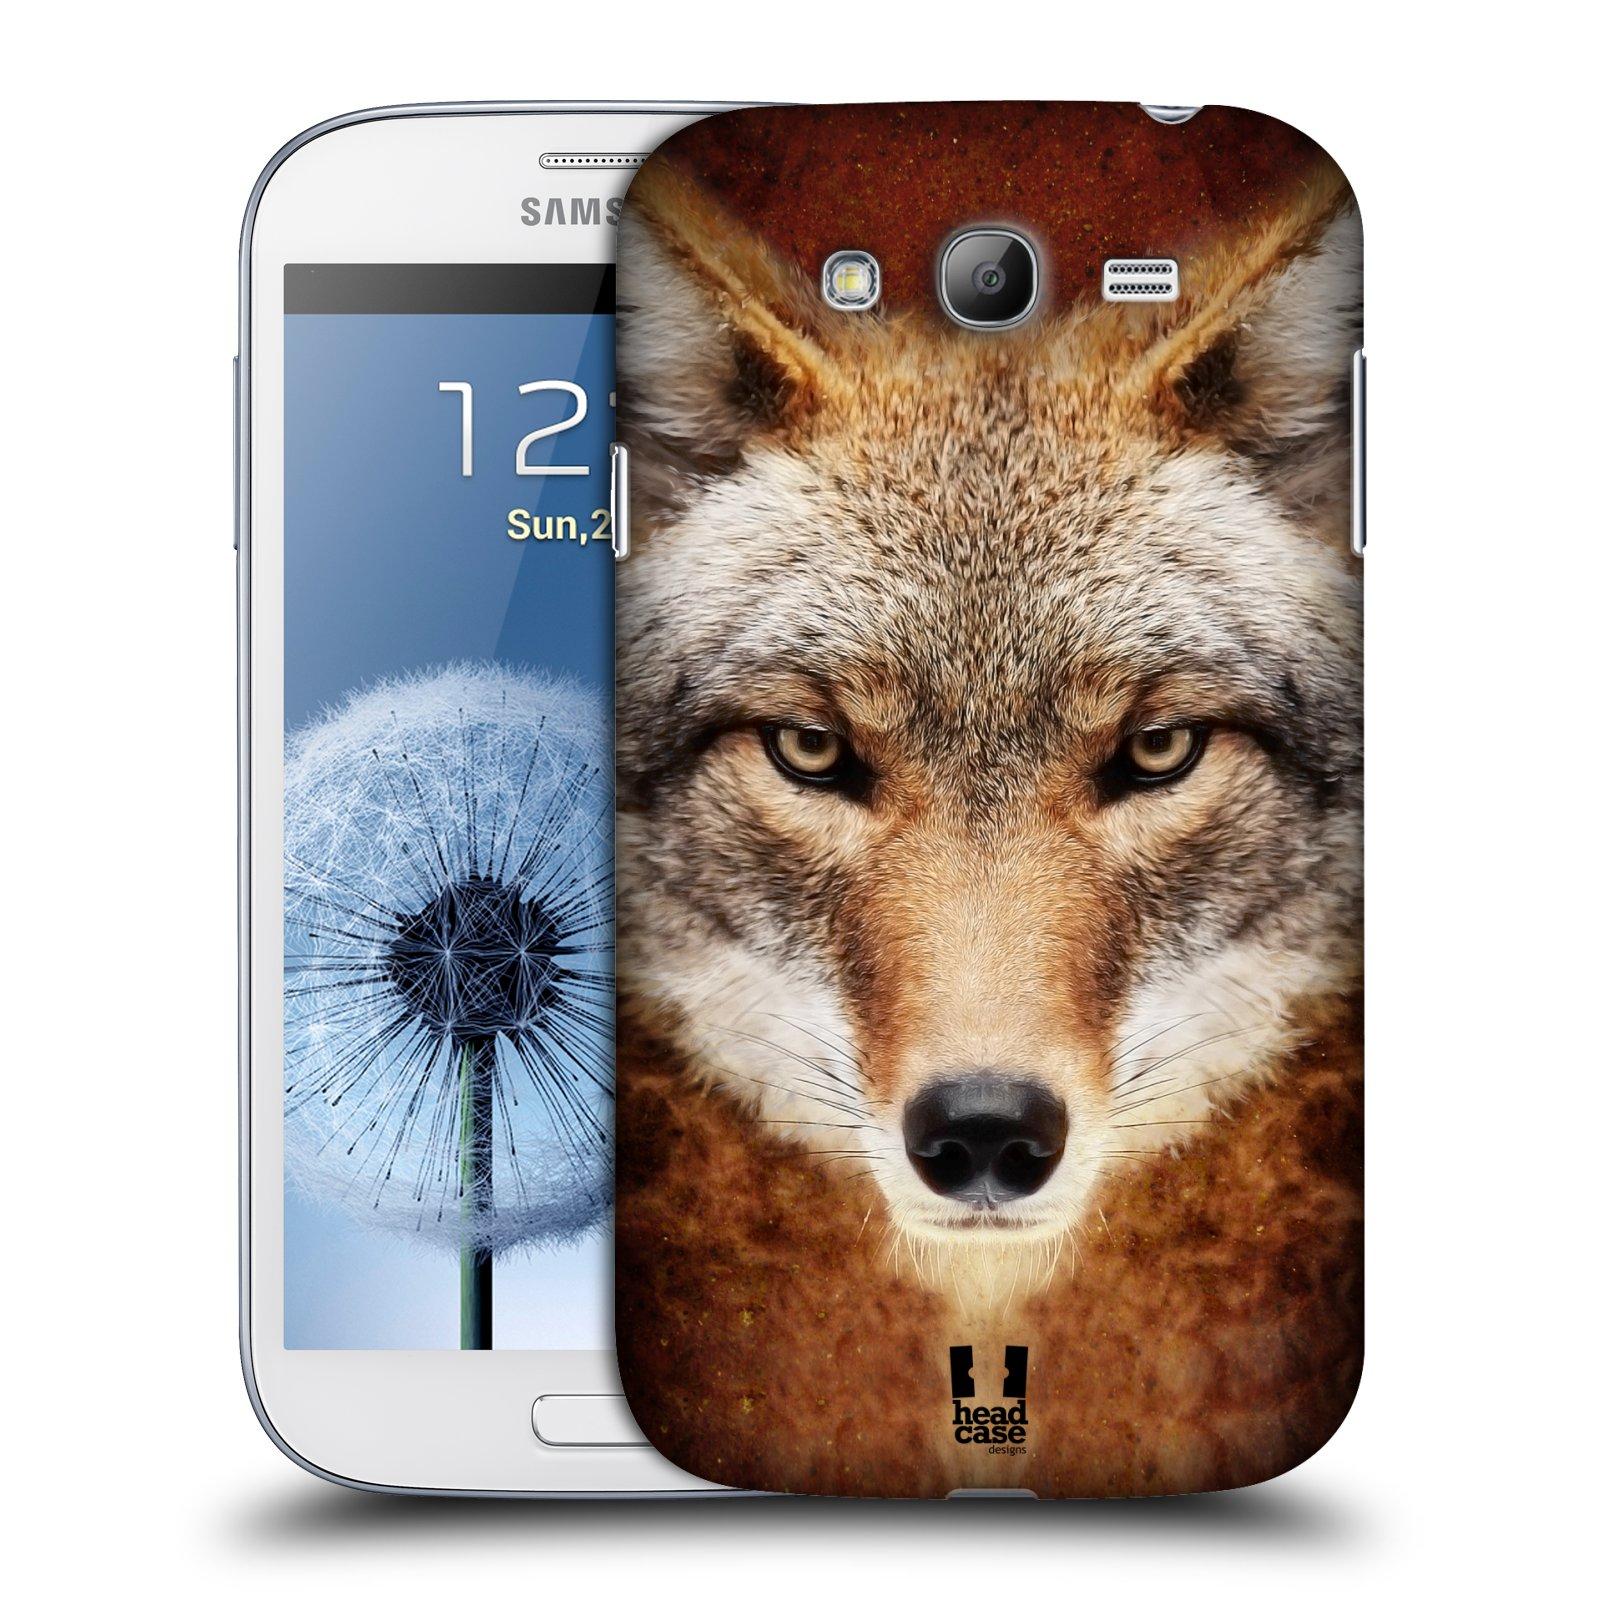 HEAD CASE plastový obal na mobil SAMSUNG GALAXY Grand i9080 vzor Zvířecí tváře kojot